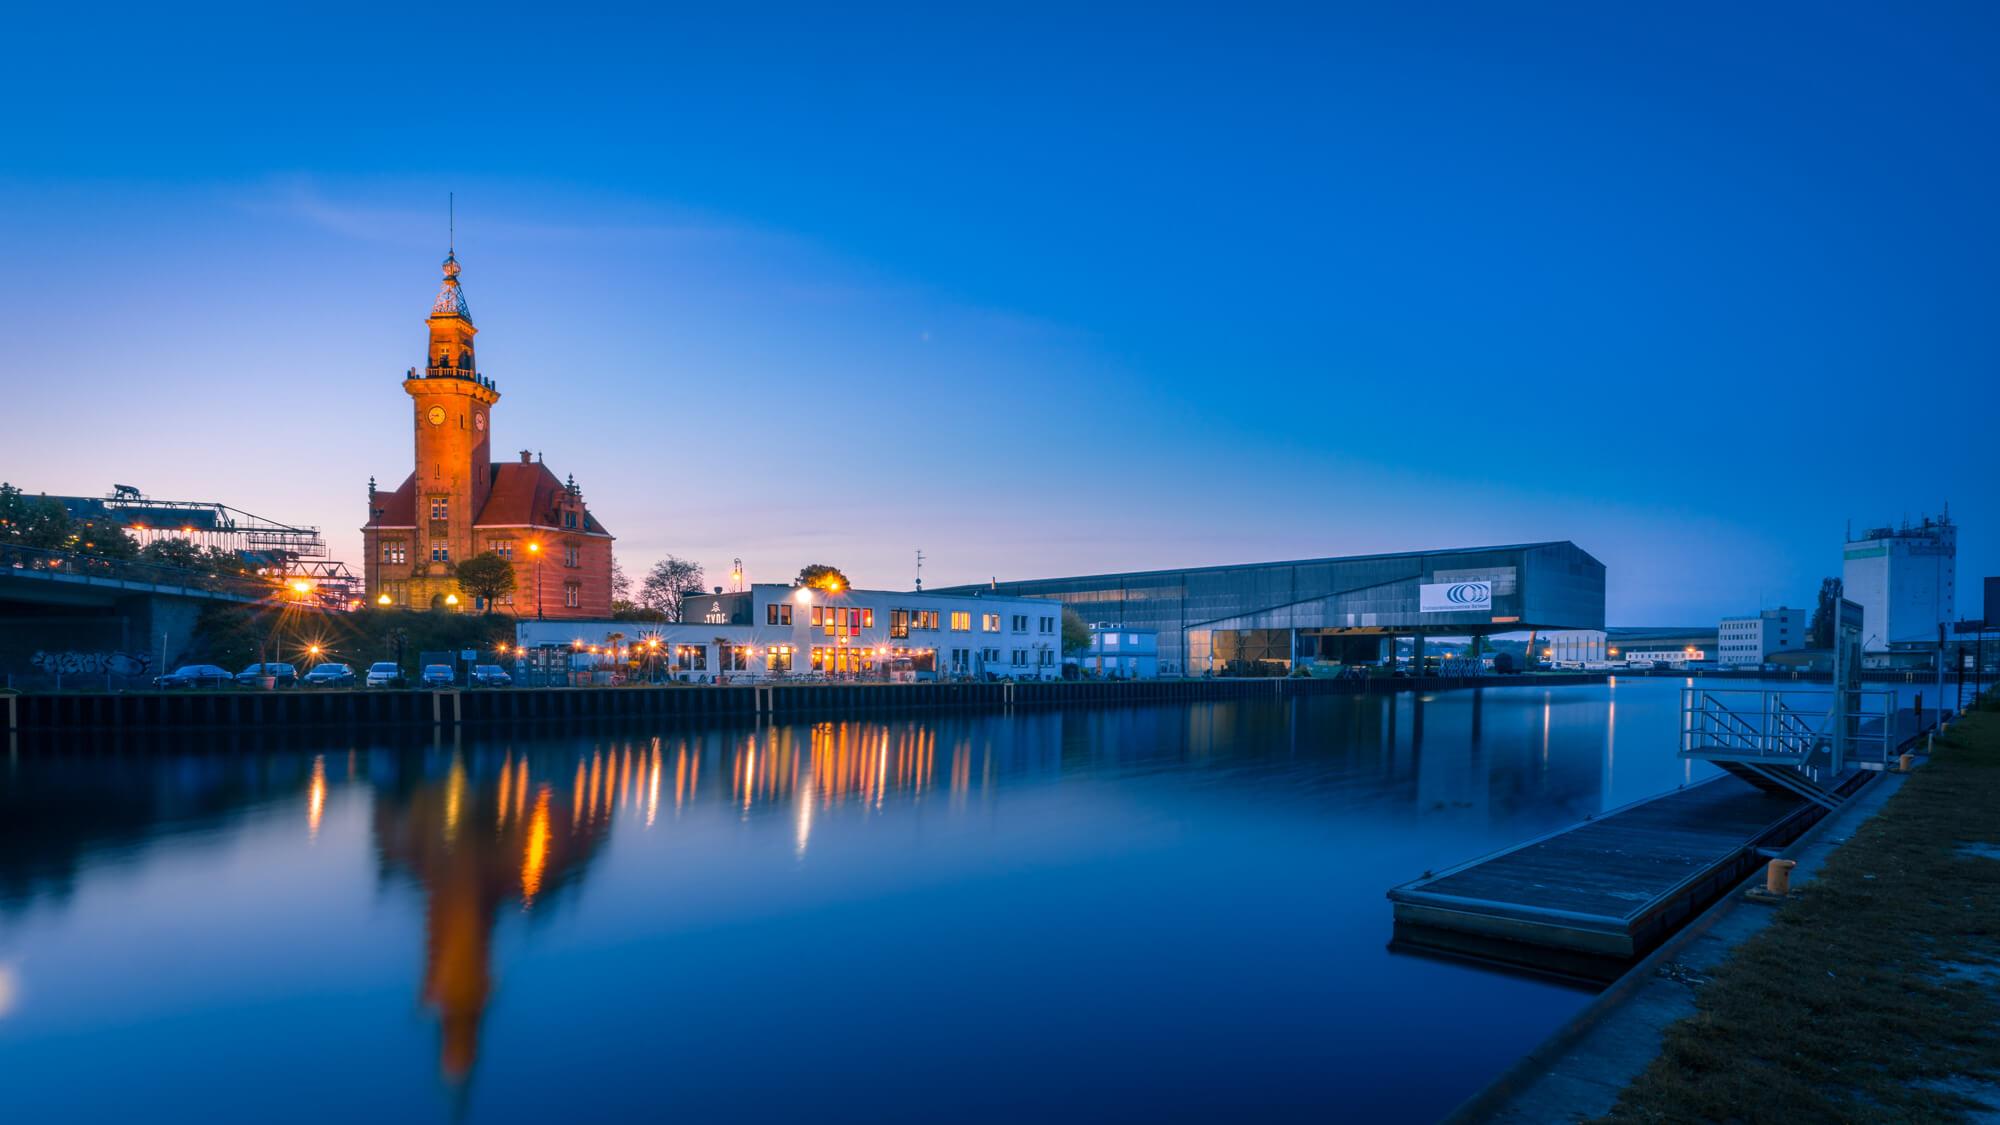 Dortmund Hafenamt